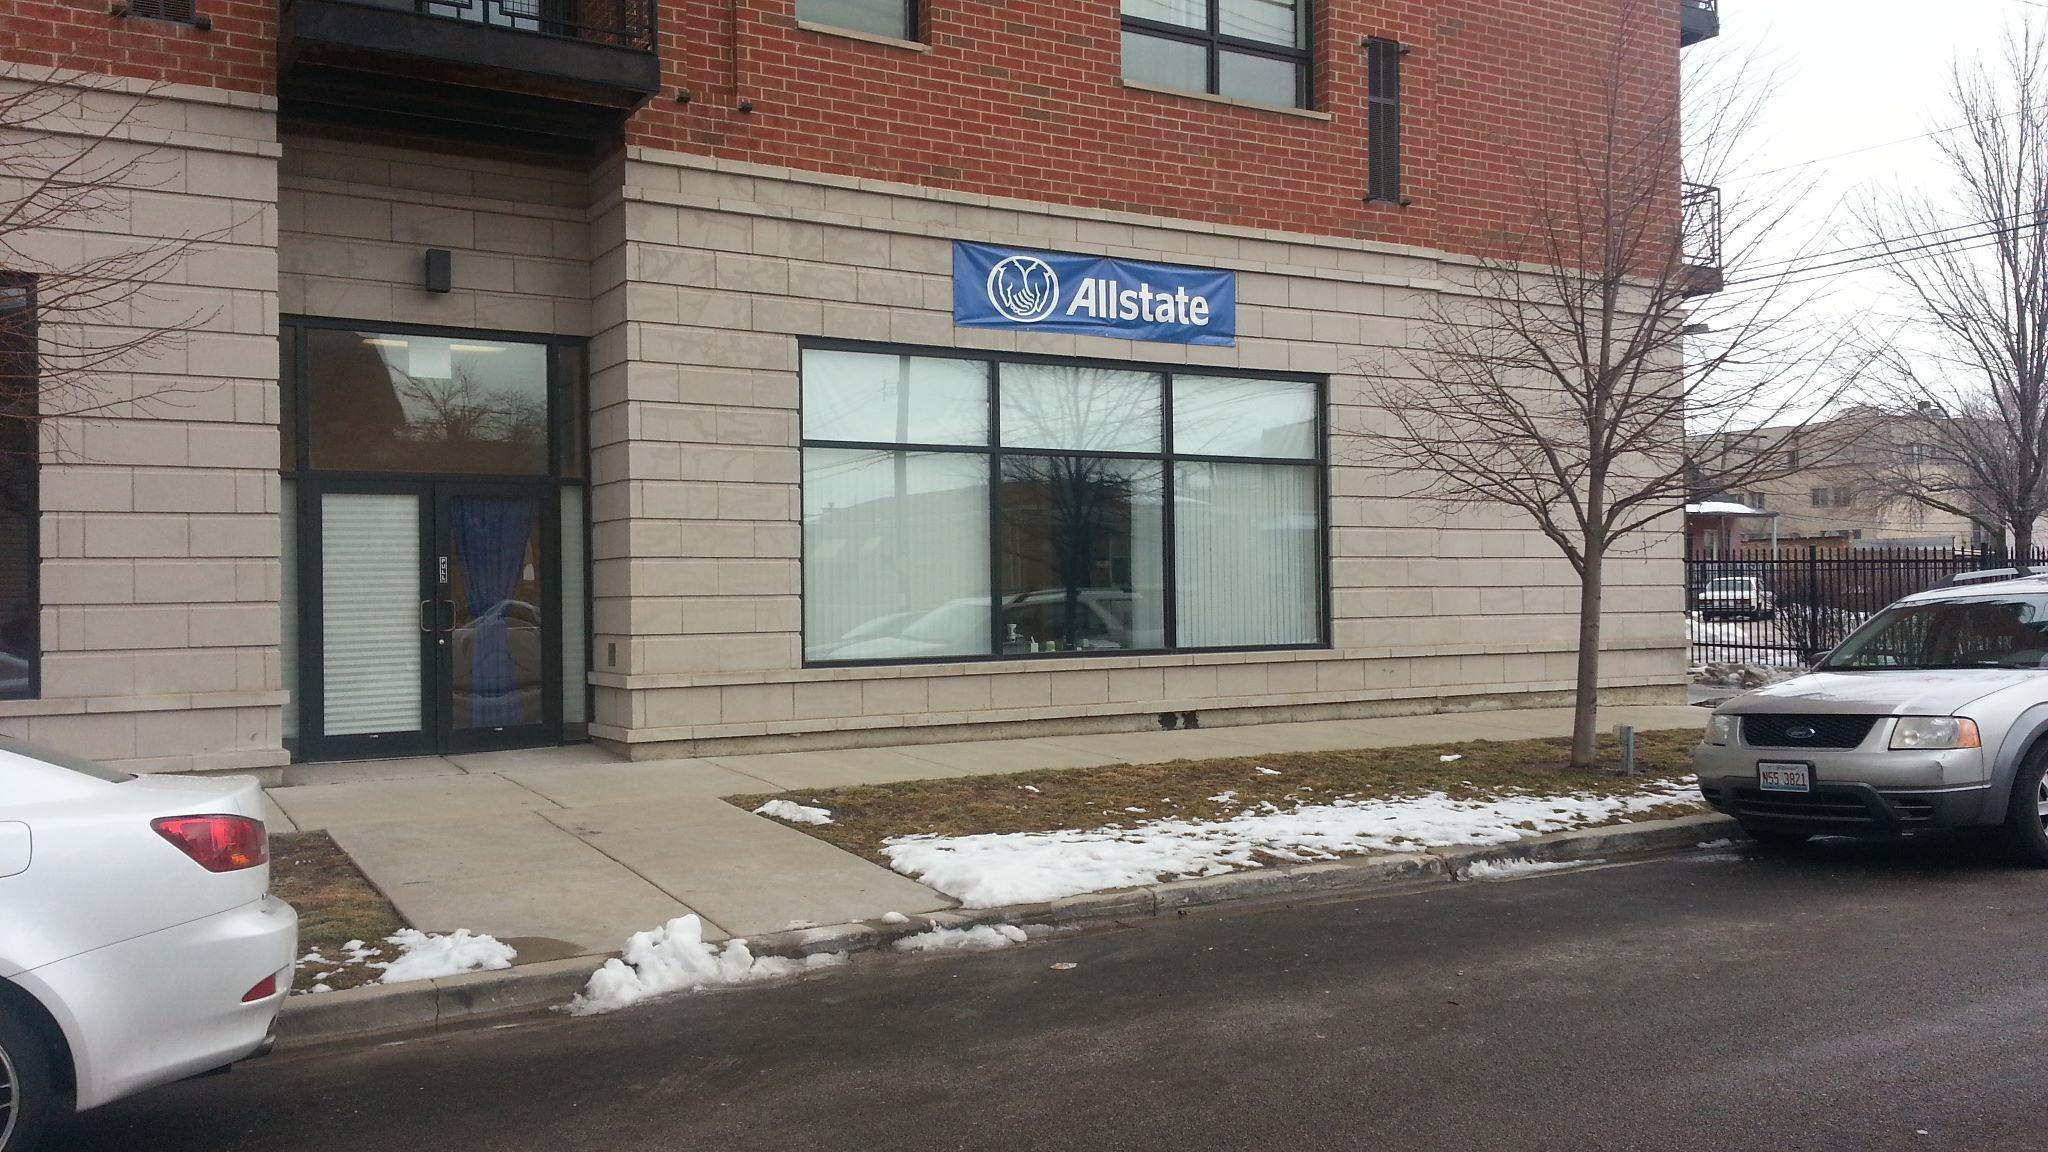 Tony Wong: Allstate Insurance